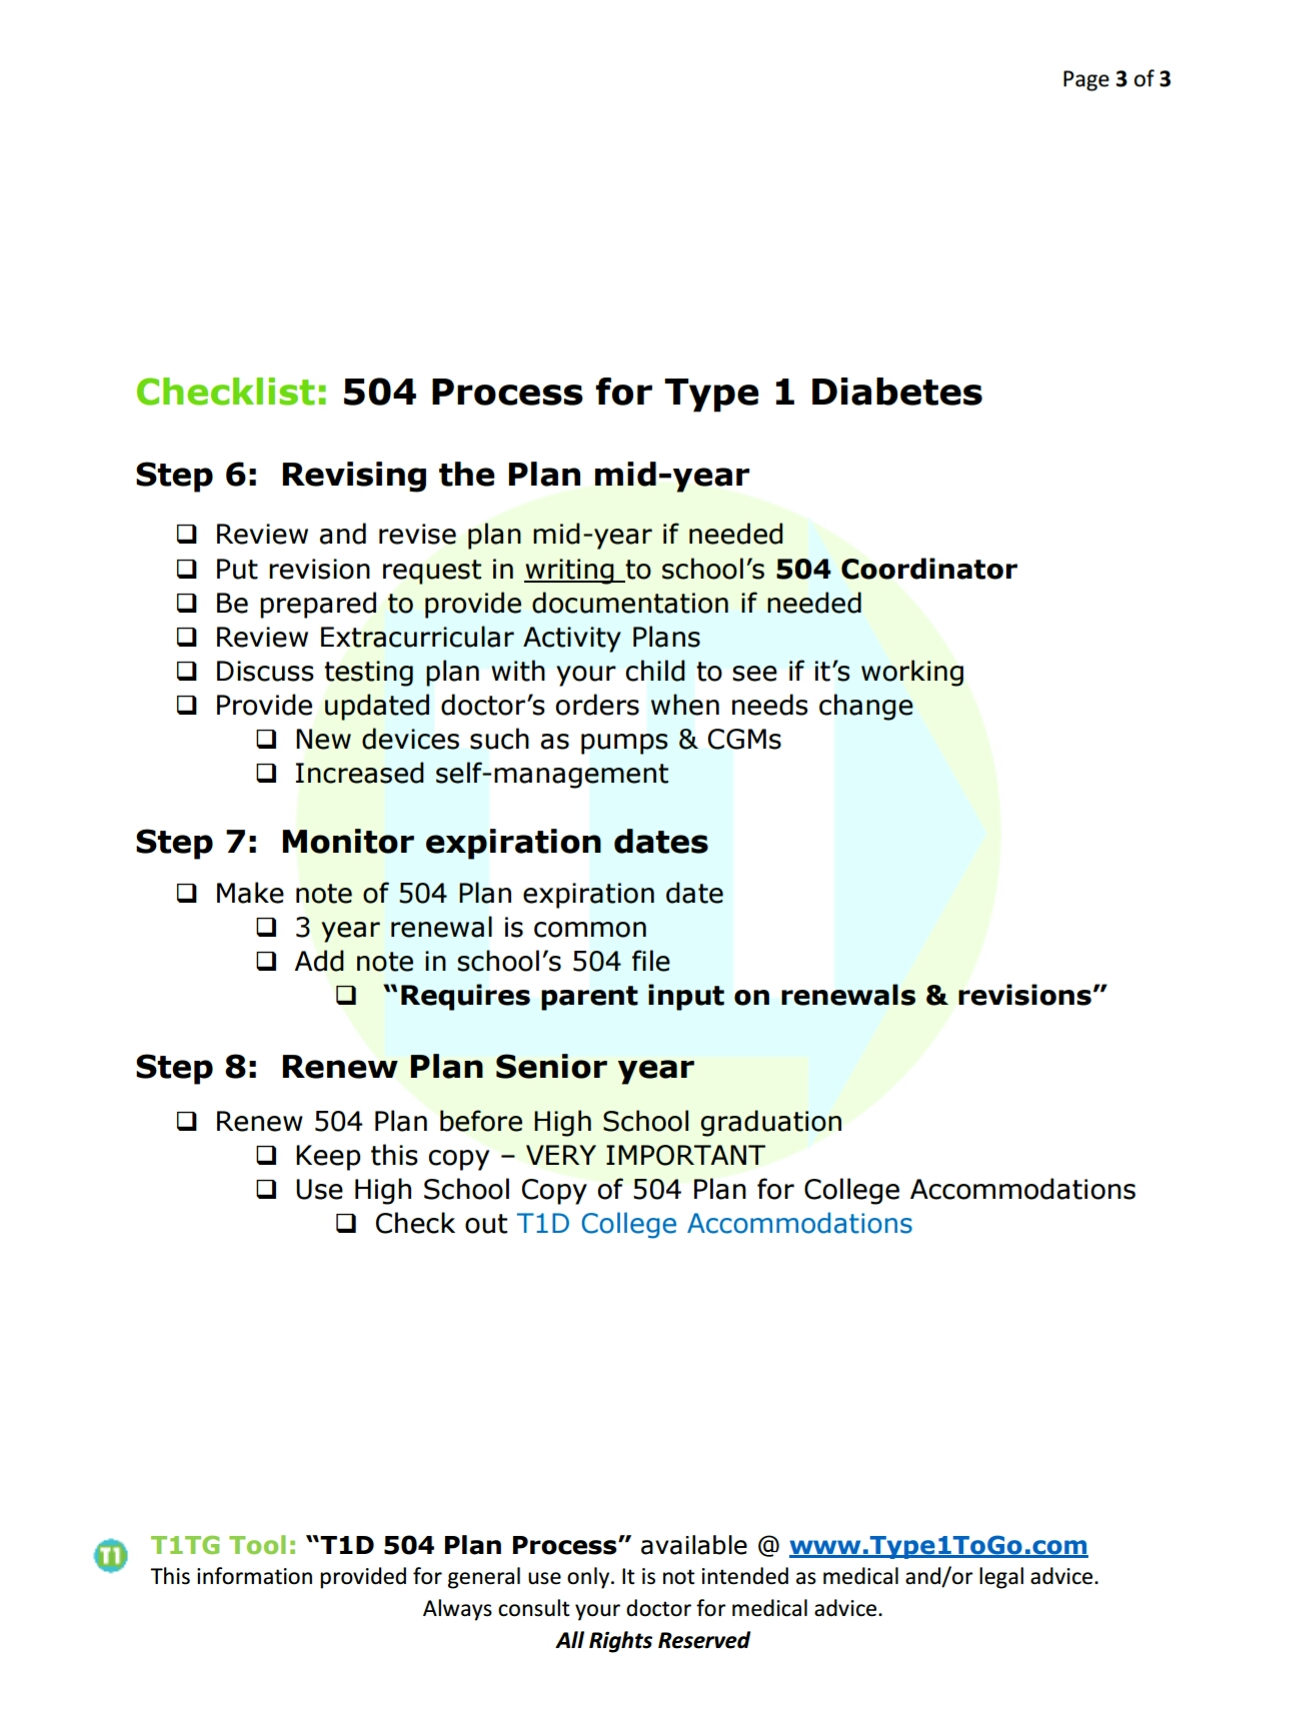 504 Plans For Type 1 Diabetics